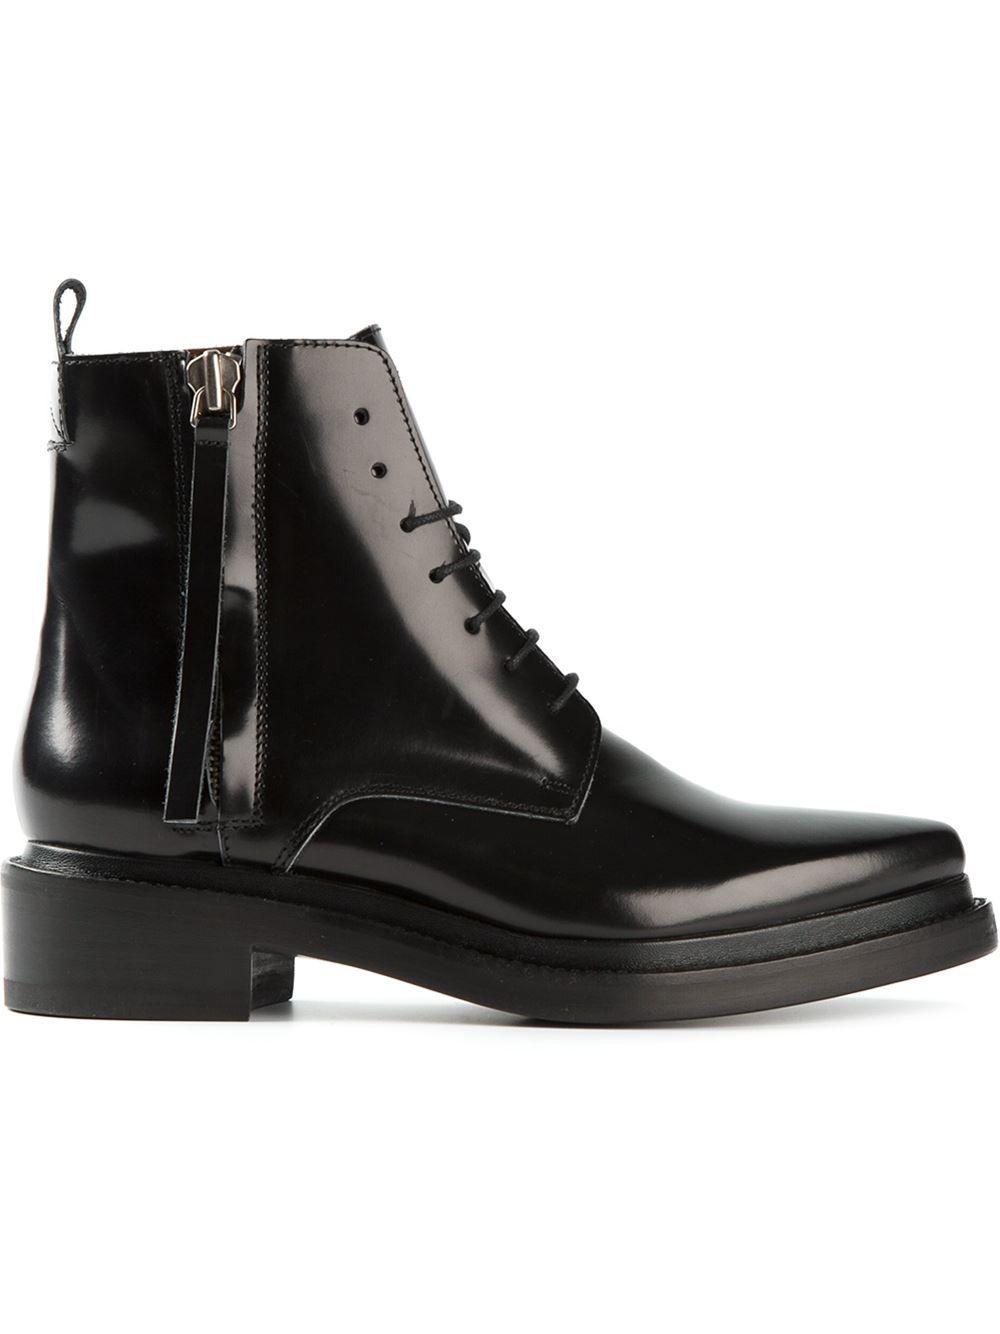 Acne Studios  linden  Ankle Boots - Fiacchini - Farfetch.com   Black ... ed3f0e205eb